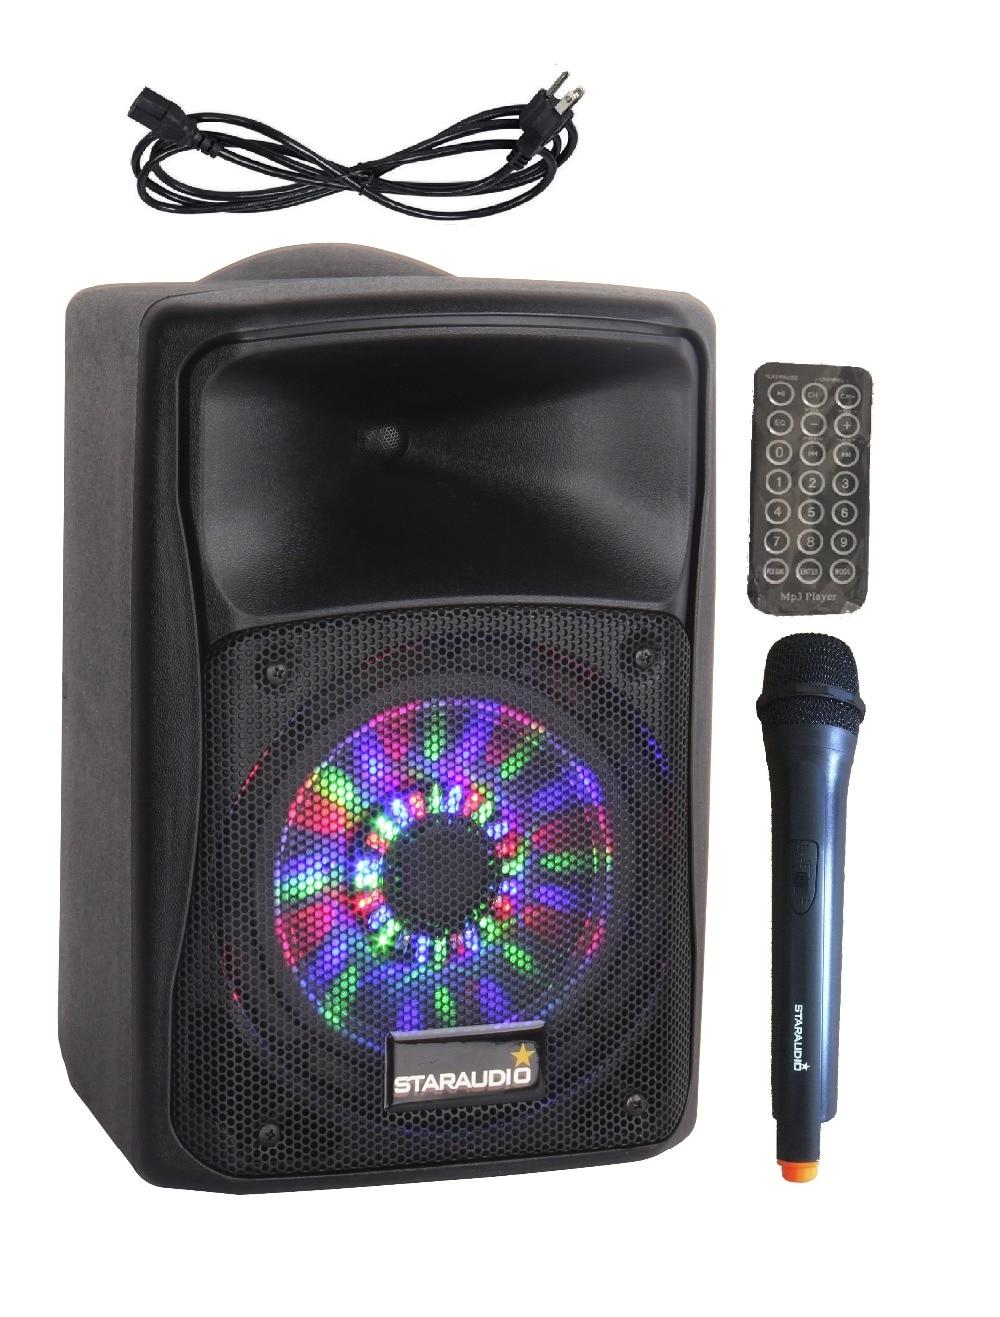 STARAUDIO Pro 8 800W PA DJ Rechargeble Battery Speaker Bluetooth UHF Microphone LED Lighting SBM 8RGB